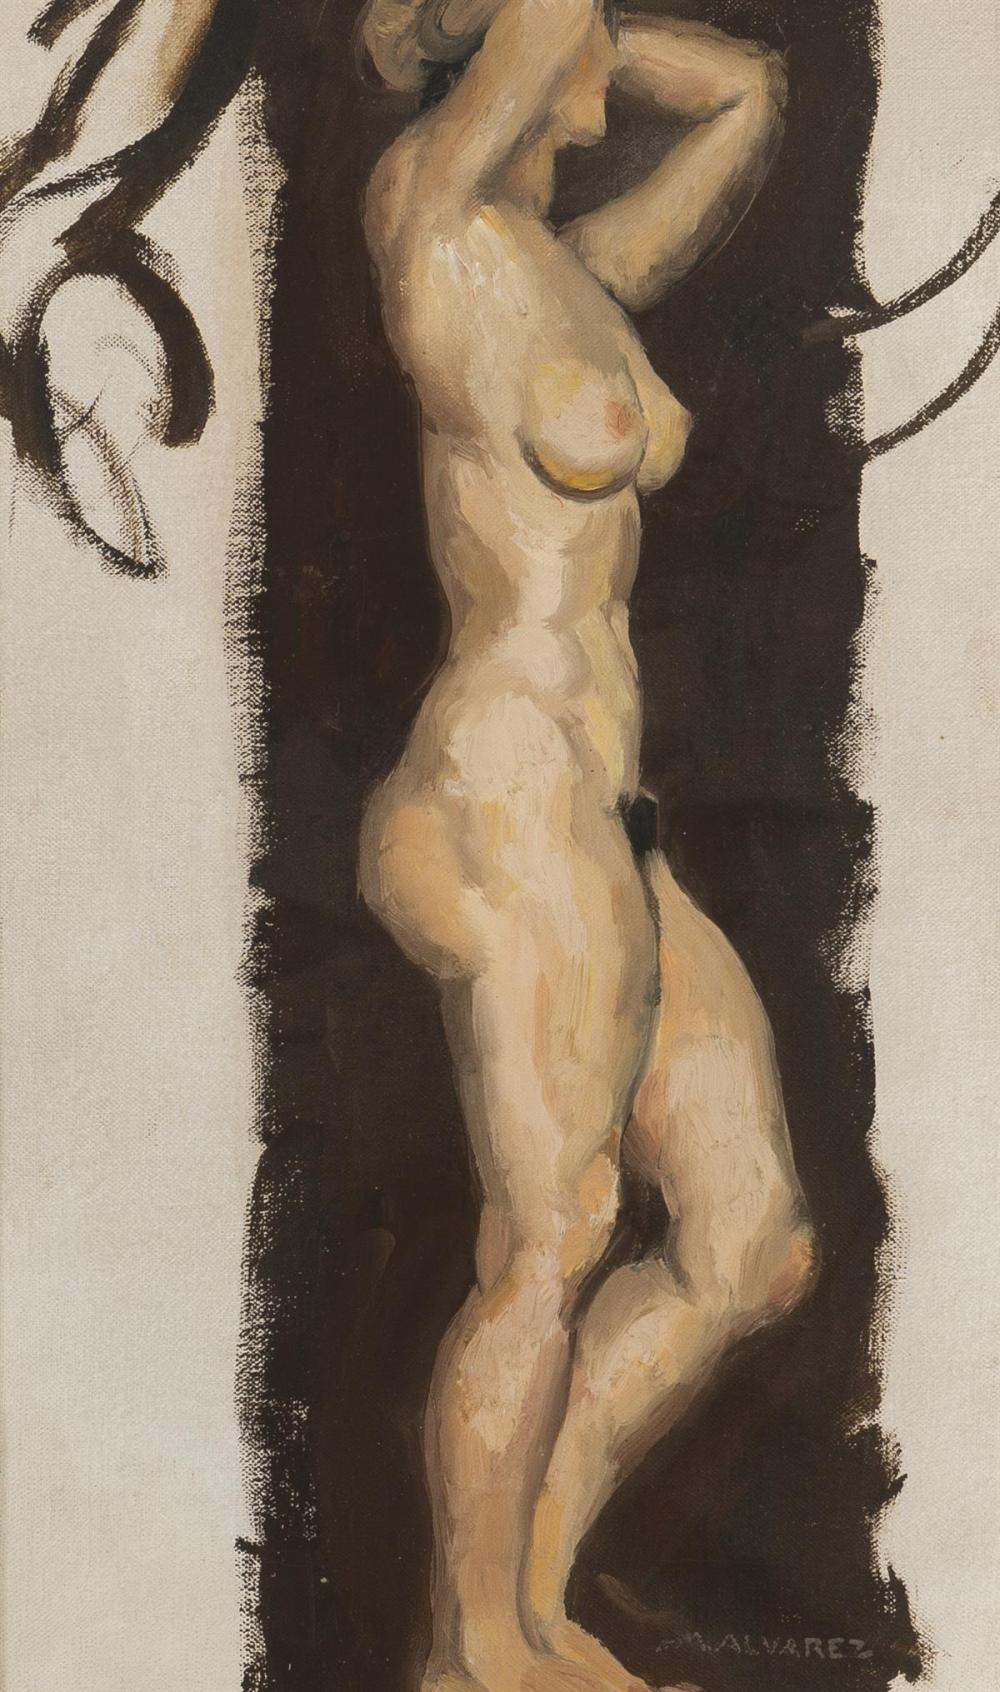 "Mabel Alvarez, (1891-1985 Los Angeles, CA), Study of a nude, Oil on canvas, 18"" H x 11"" W"